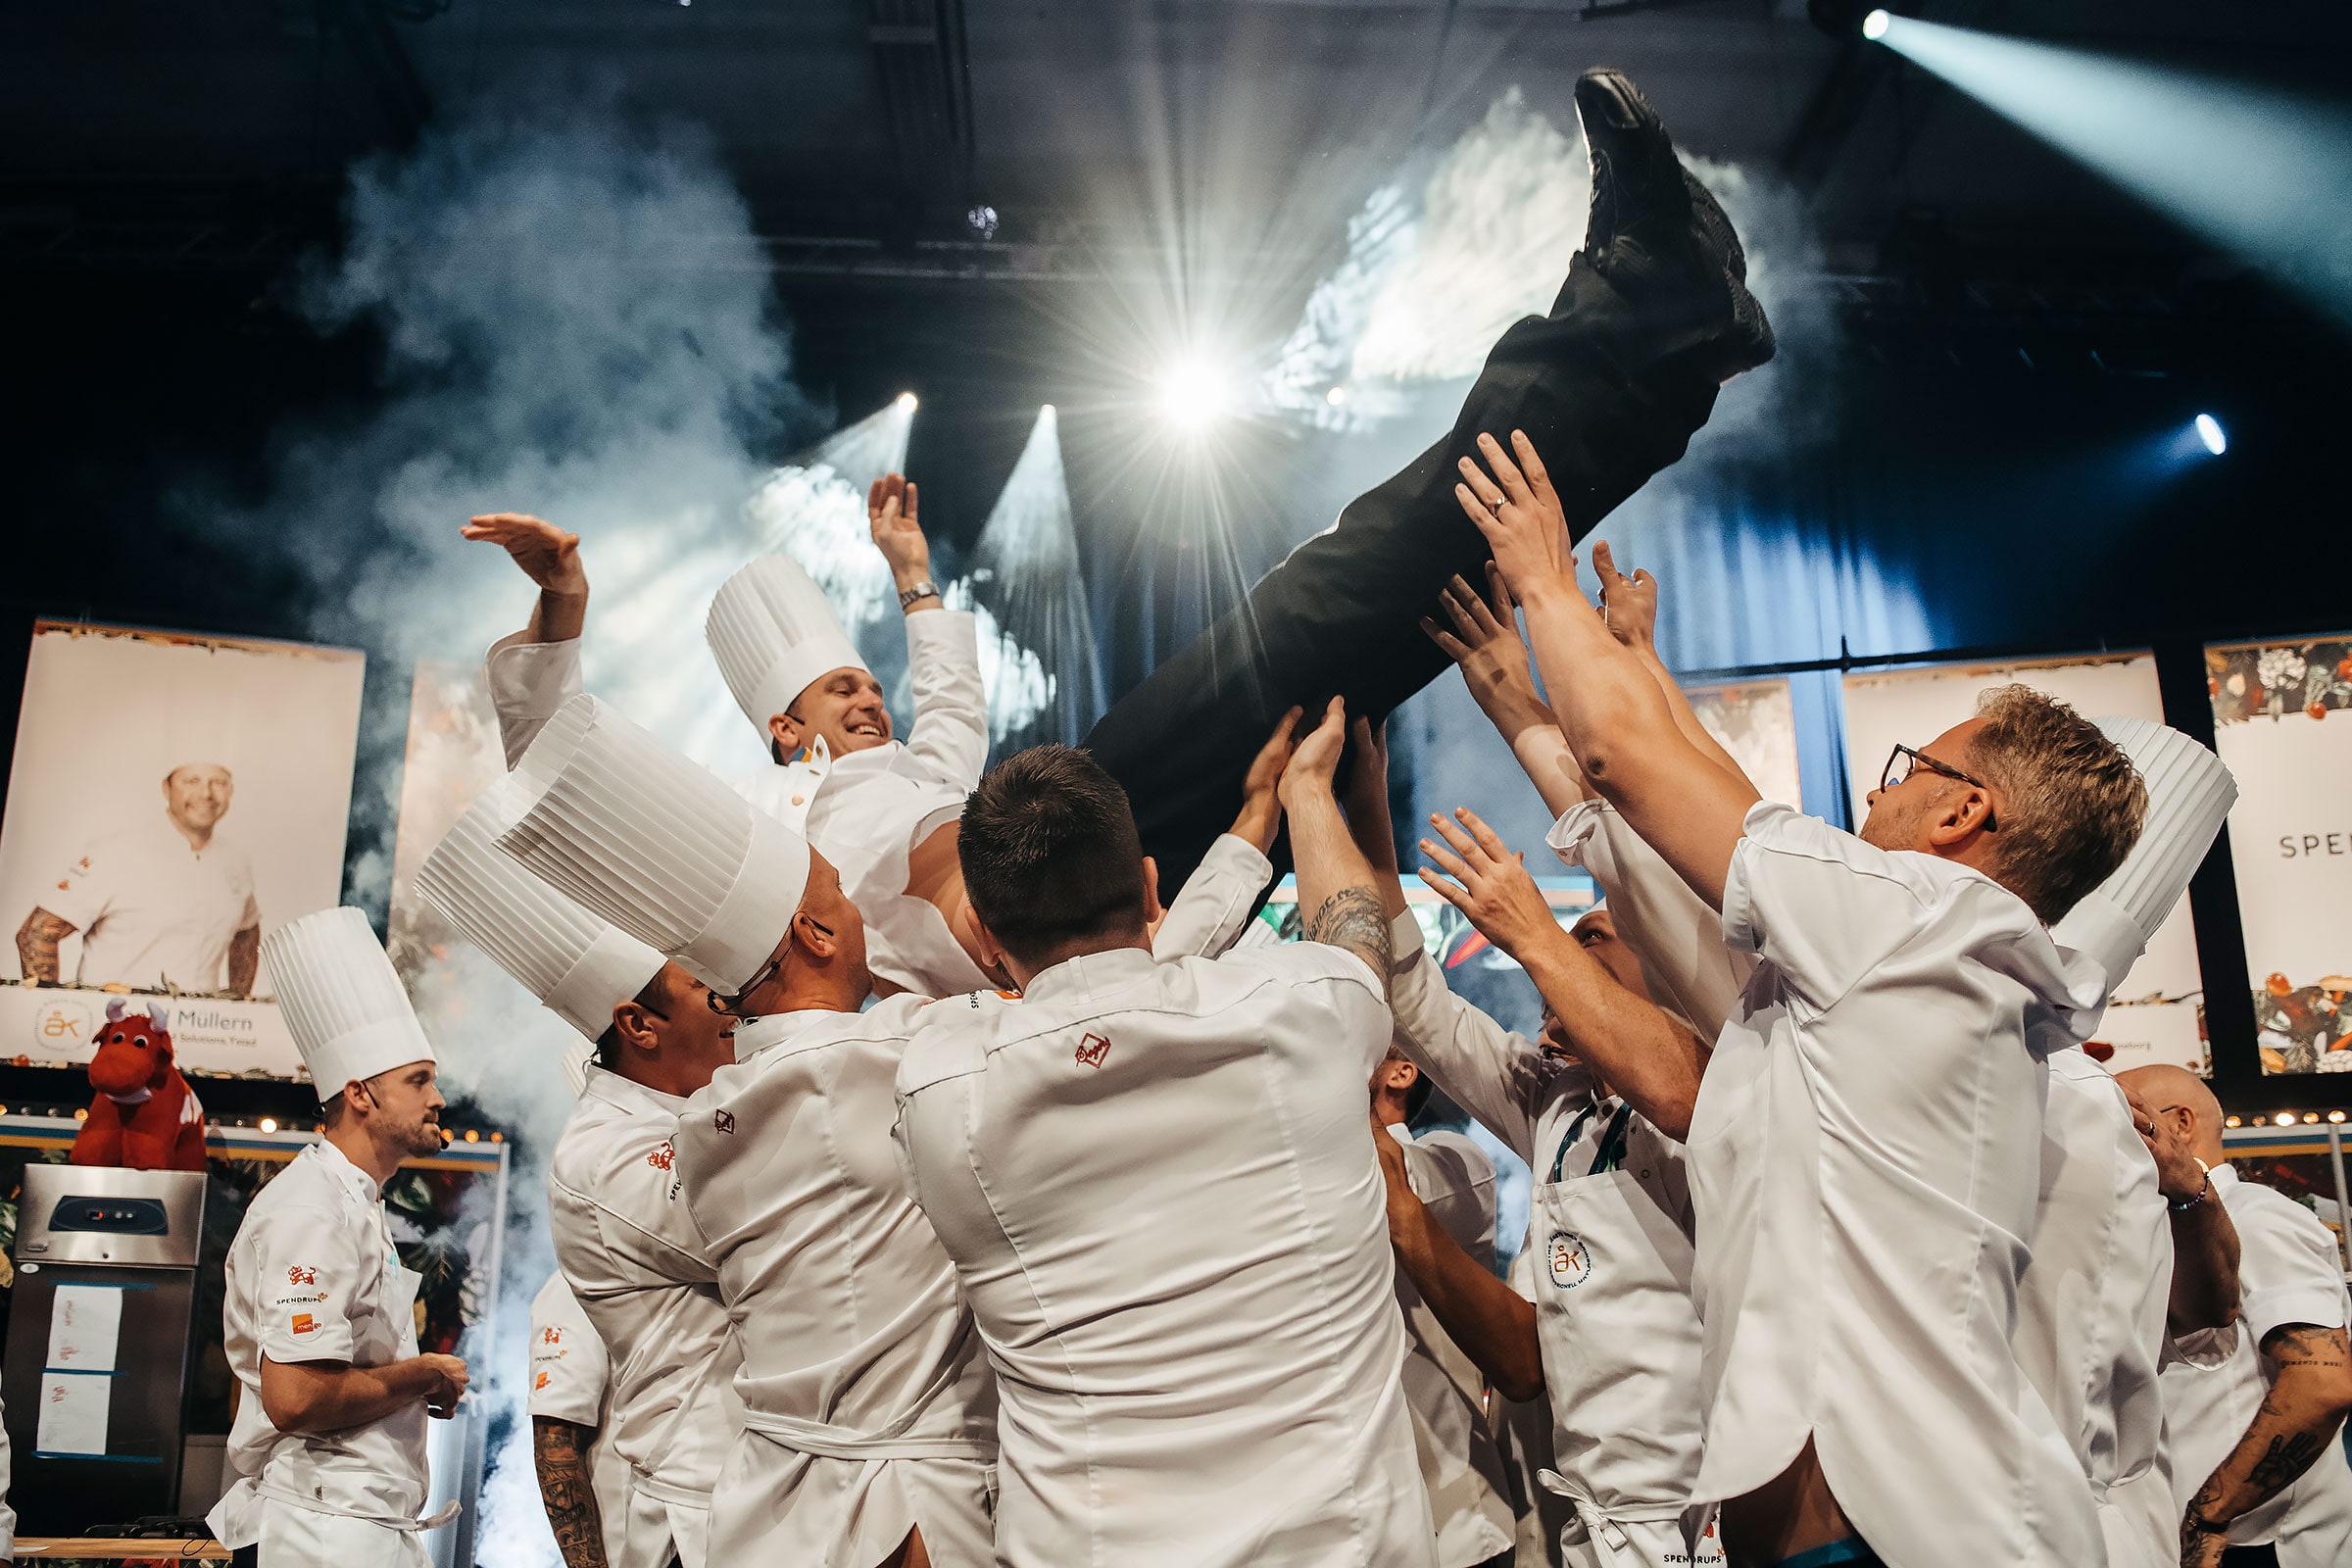 Martin Moses vann Årets Kock 2019. Foto: Samuel Unéus/Pressbild